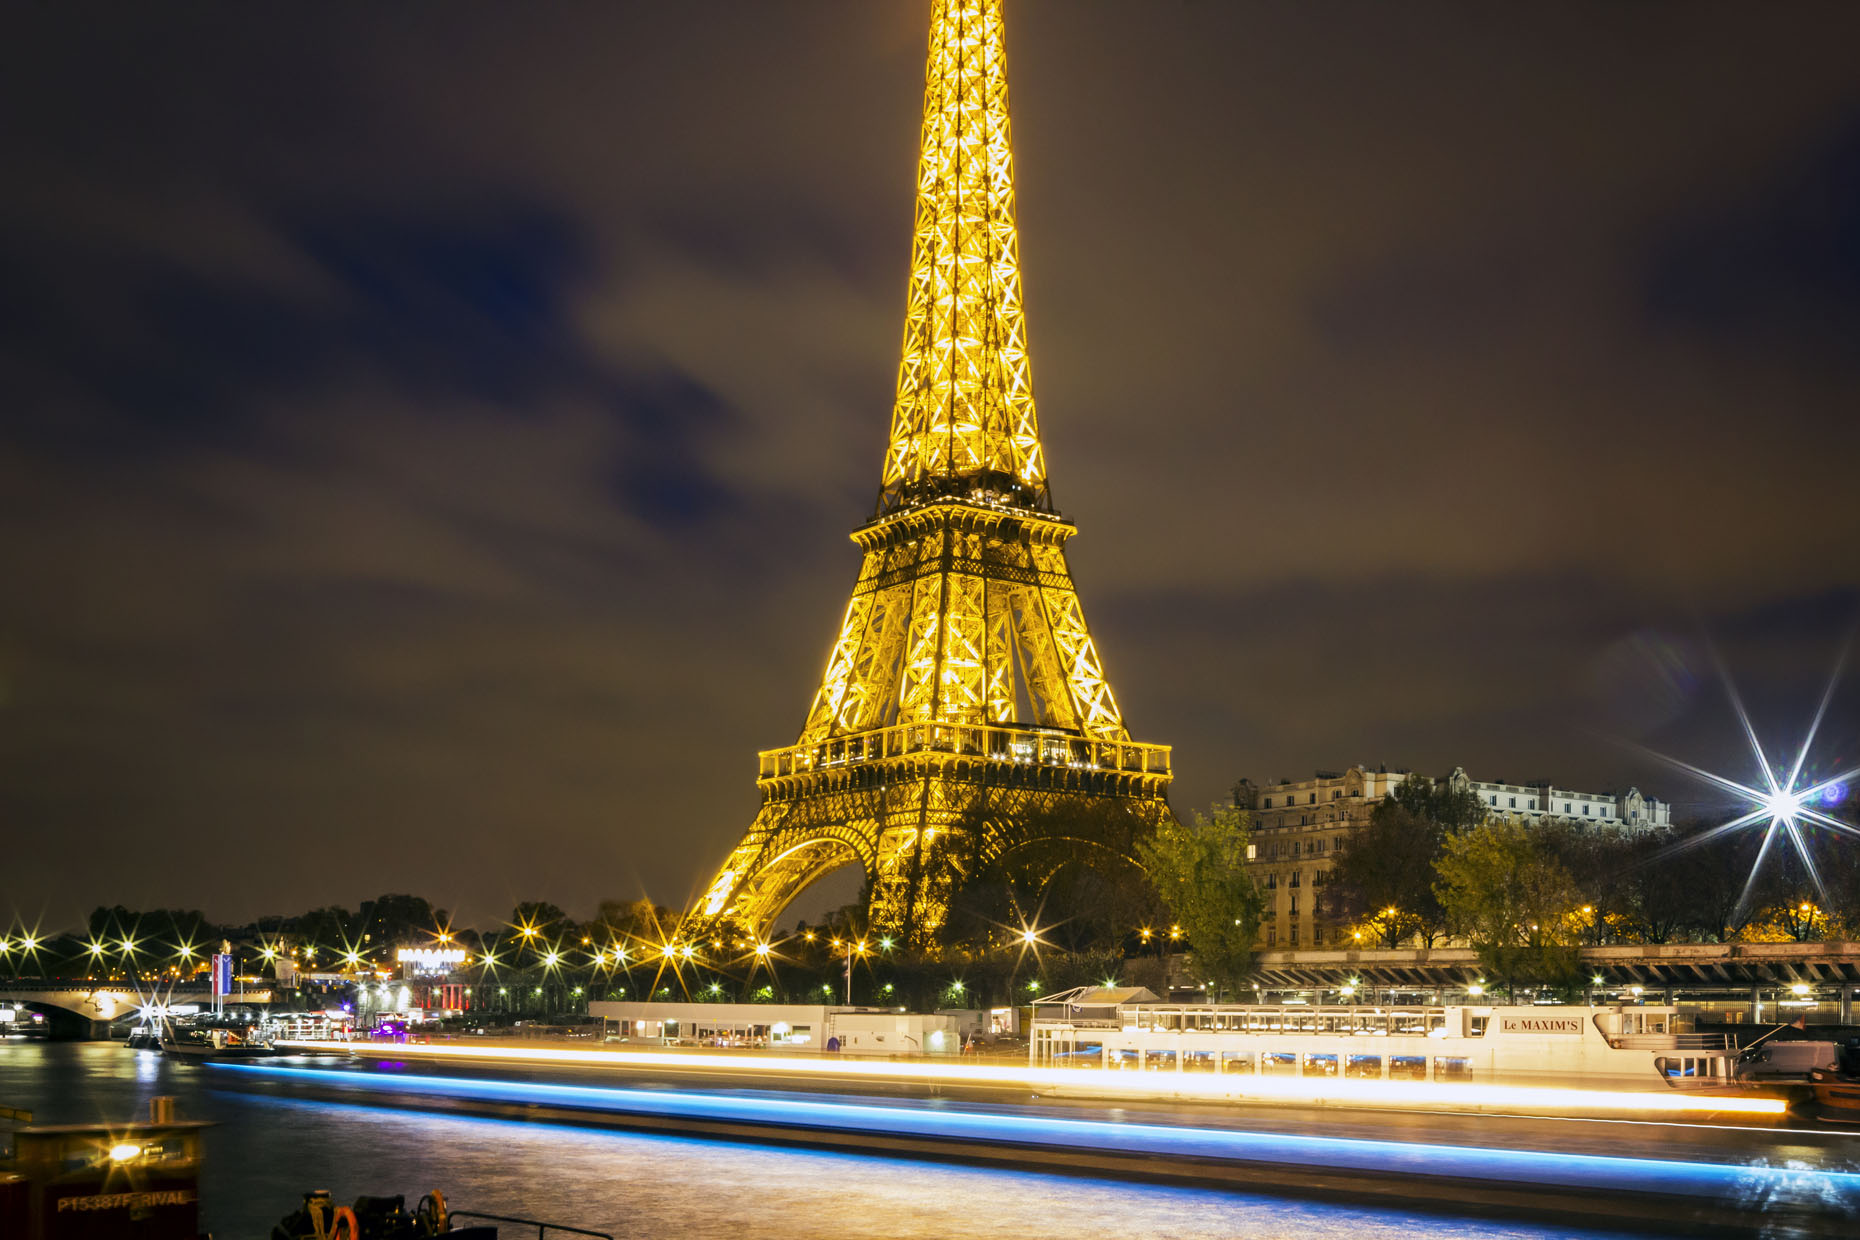 Paris_EiffelTowerTwilight_08.jpg